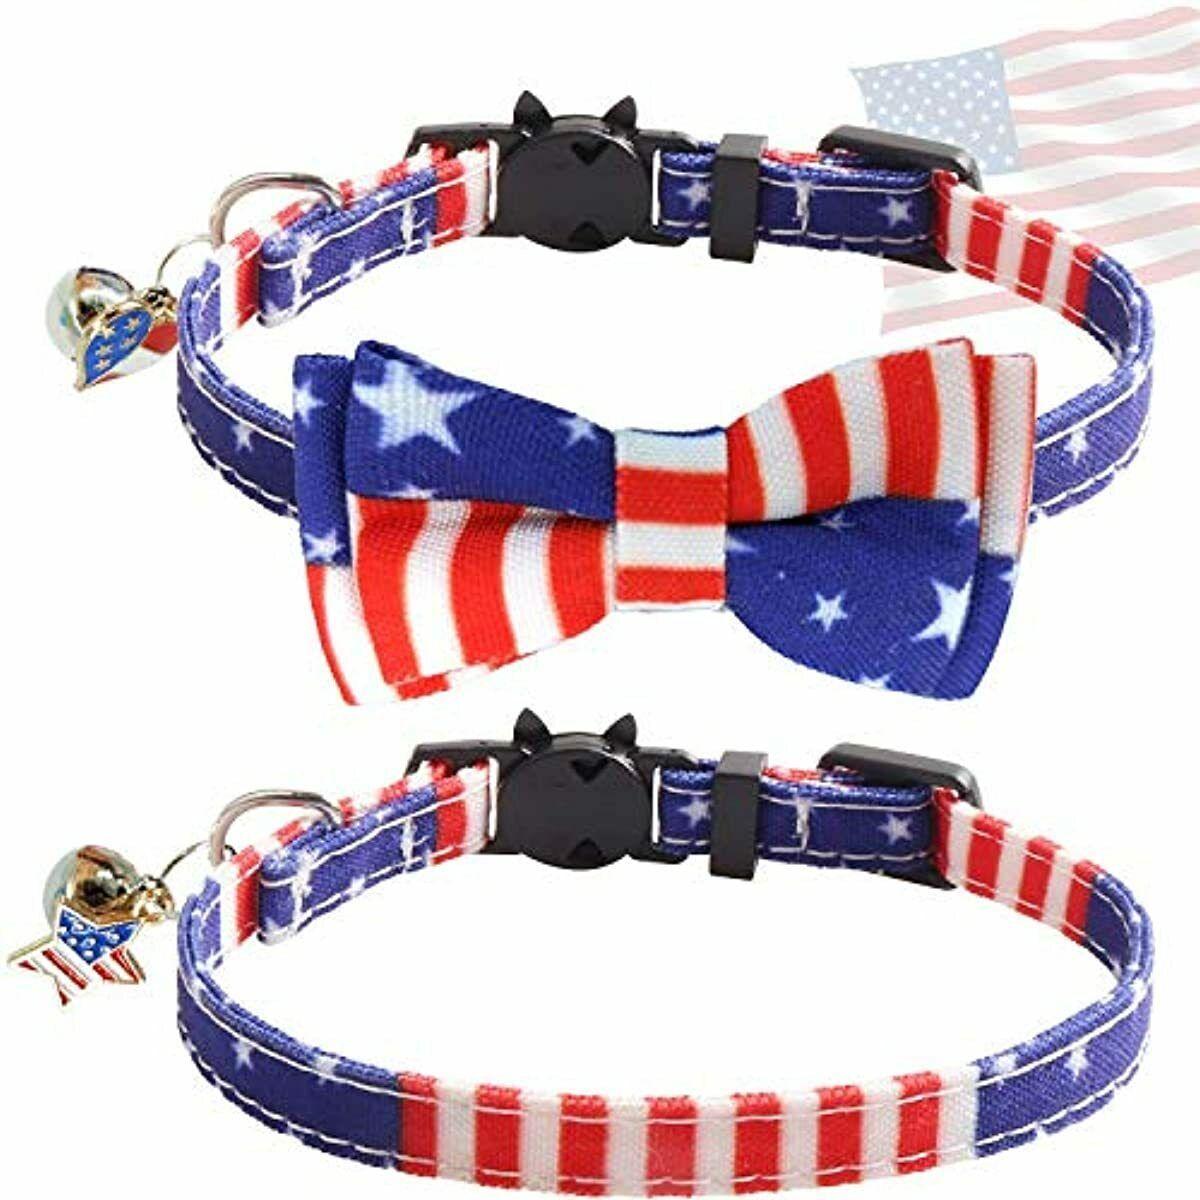 KUDES 2 Pack/Set American US Flag Breakaway Cat Collar and B